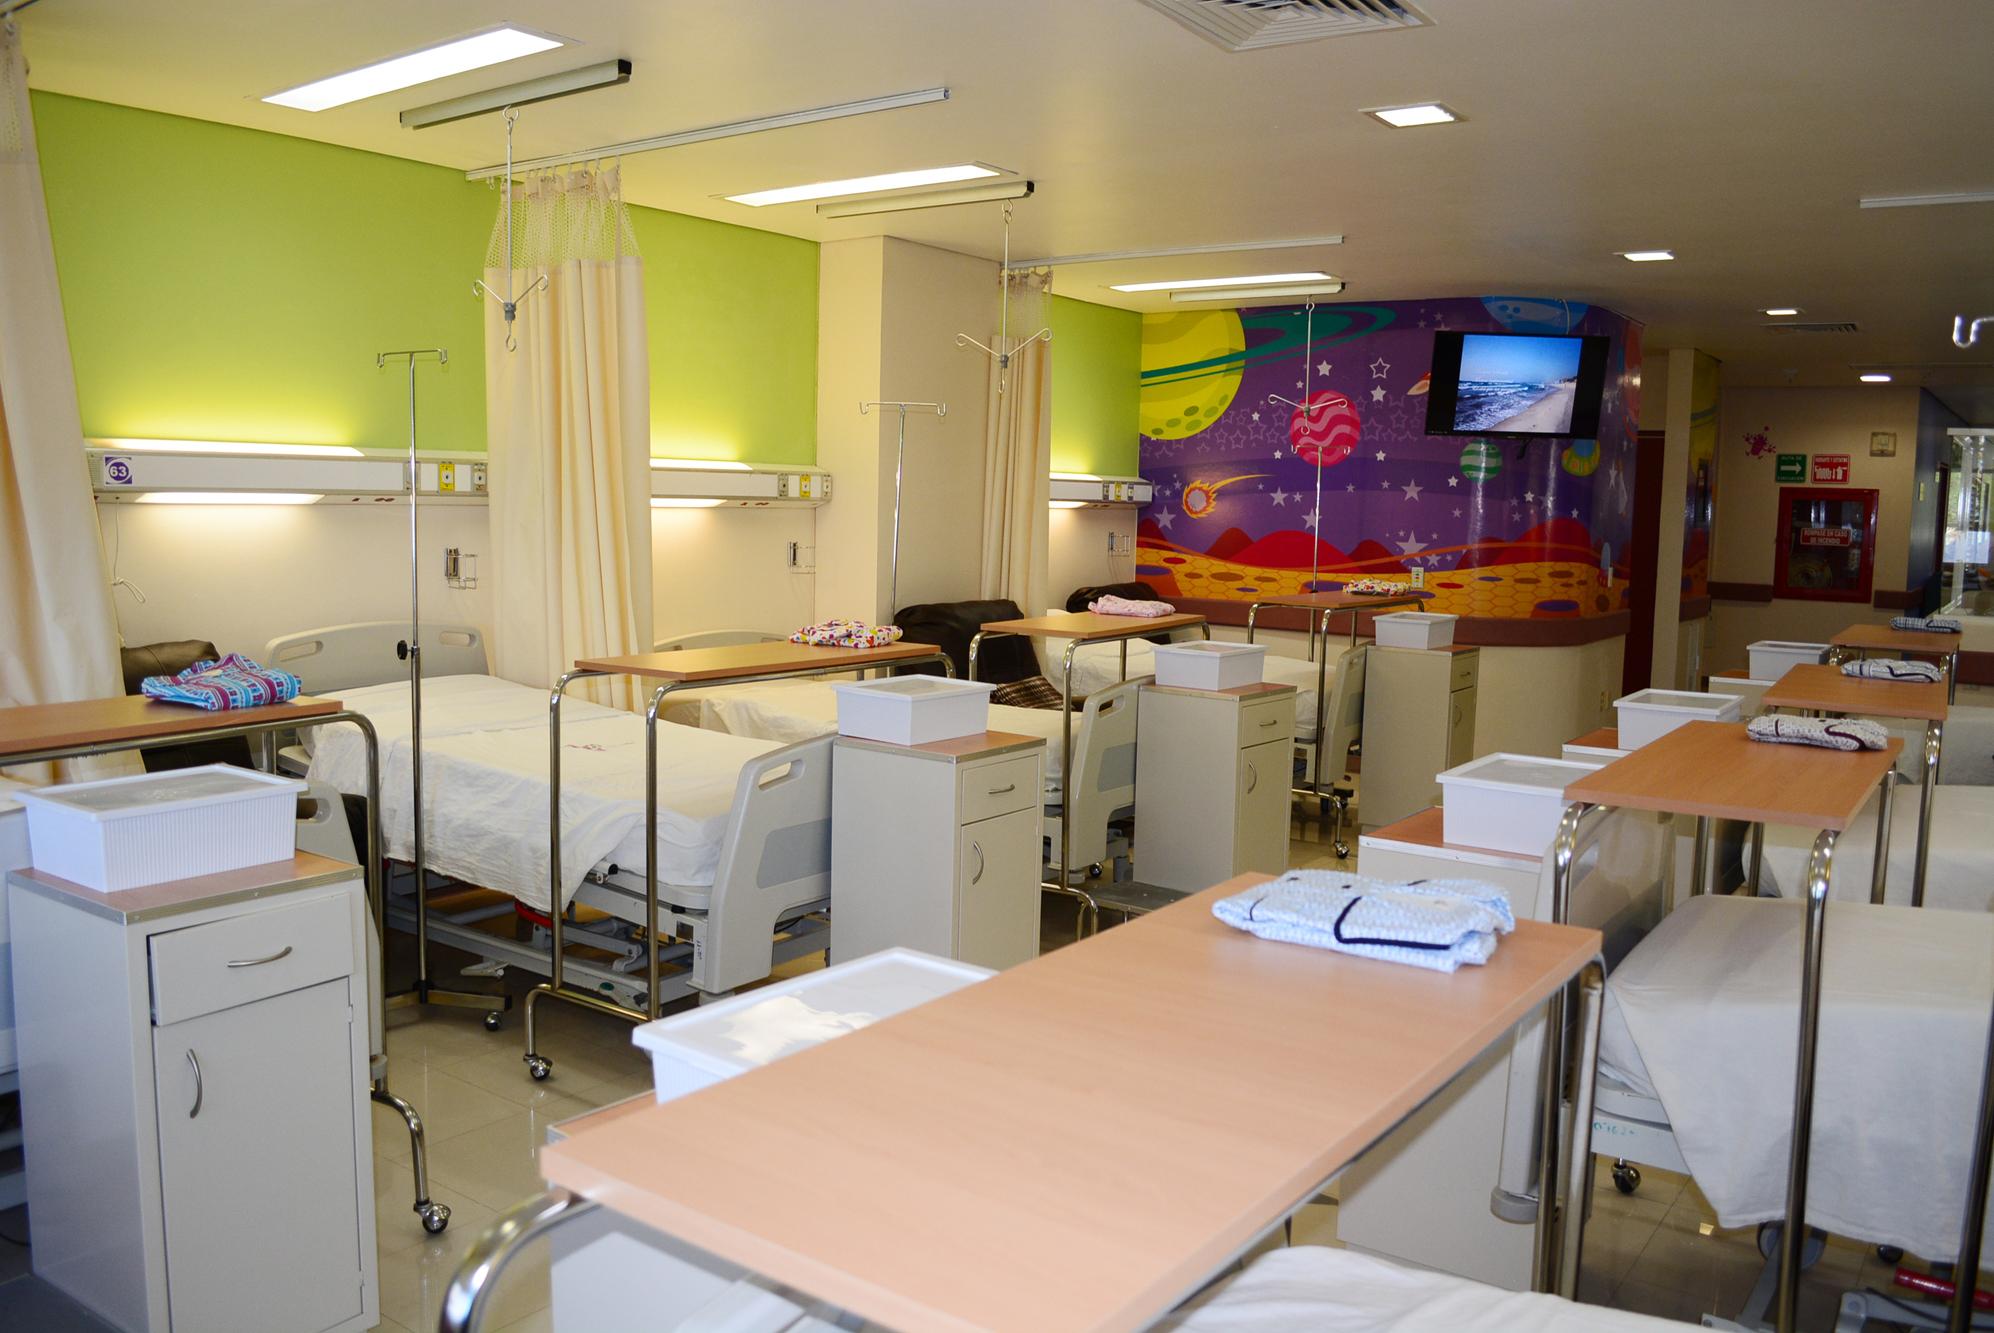 Se echan a perder camas especiales para pacientes con cáncer de médula ósea